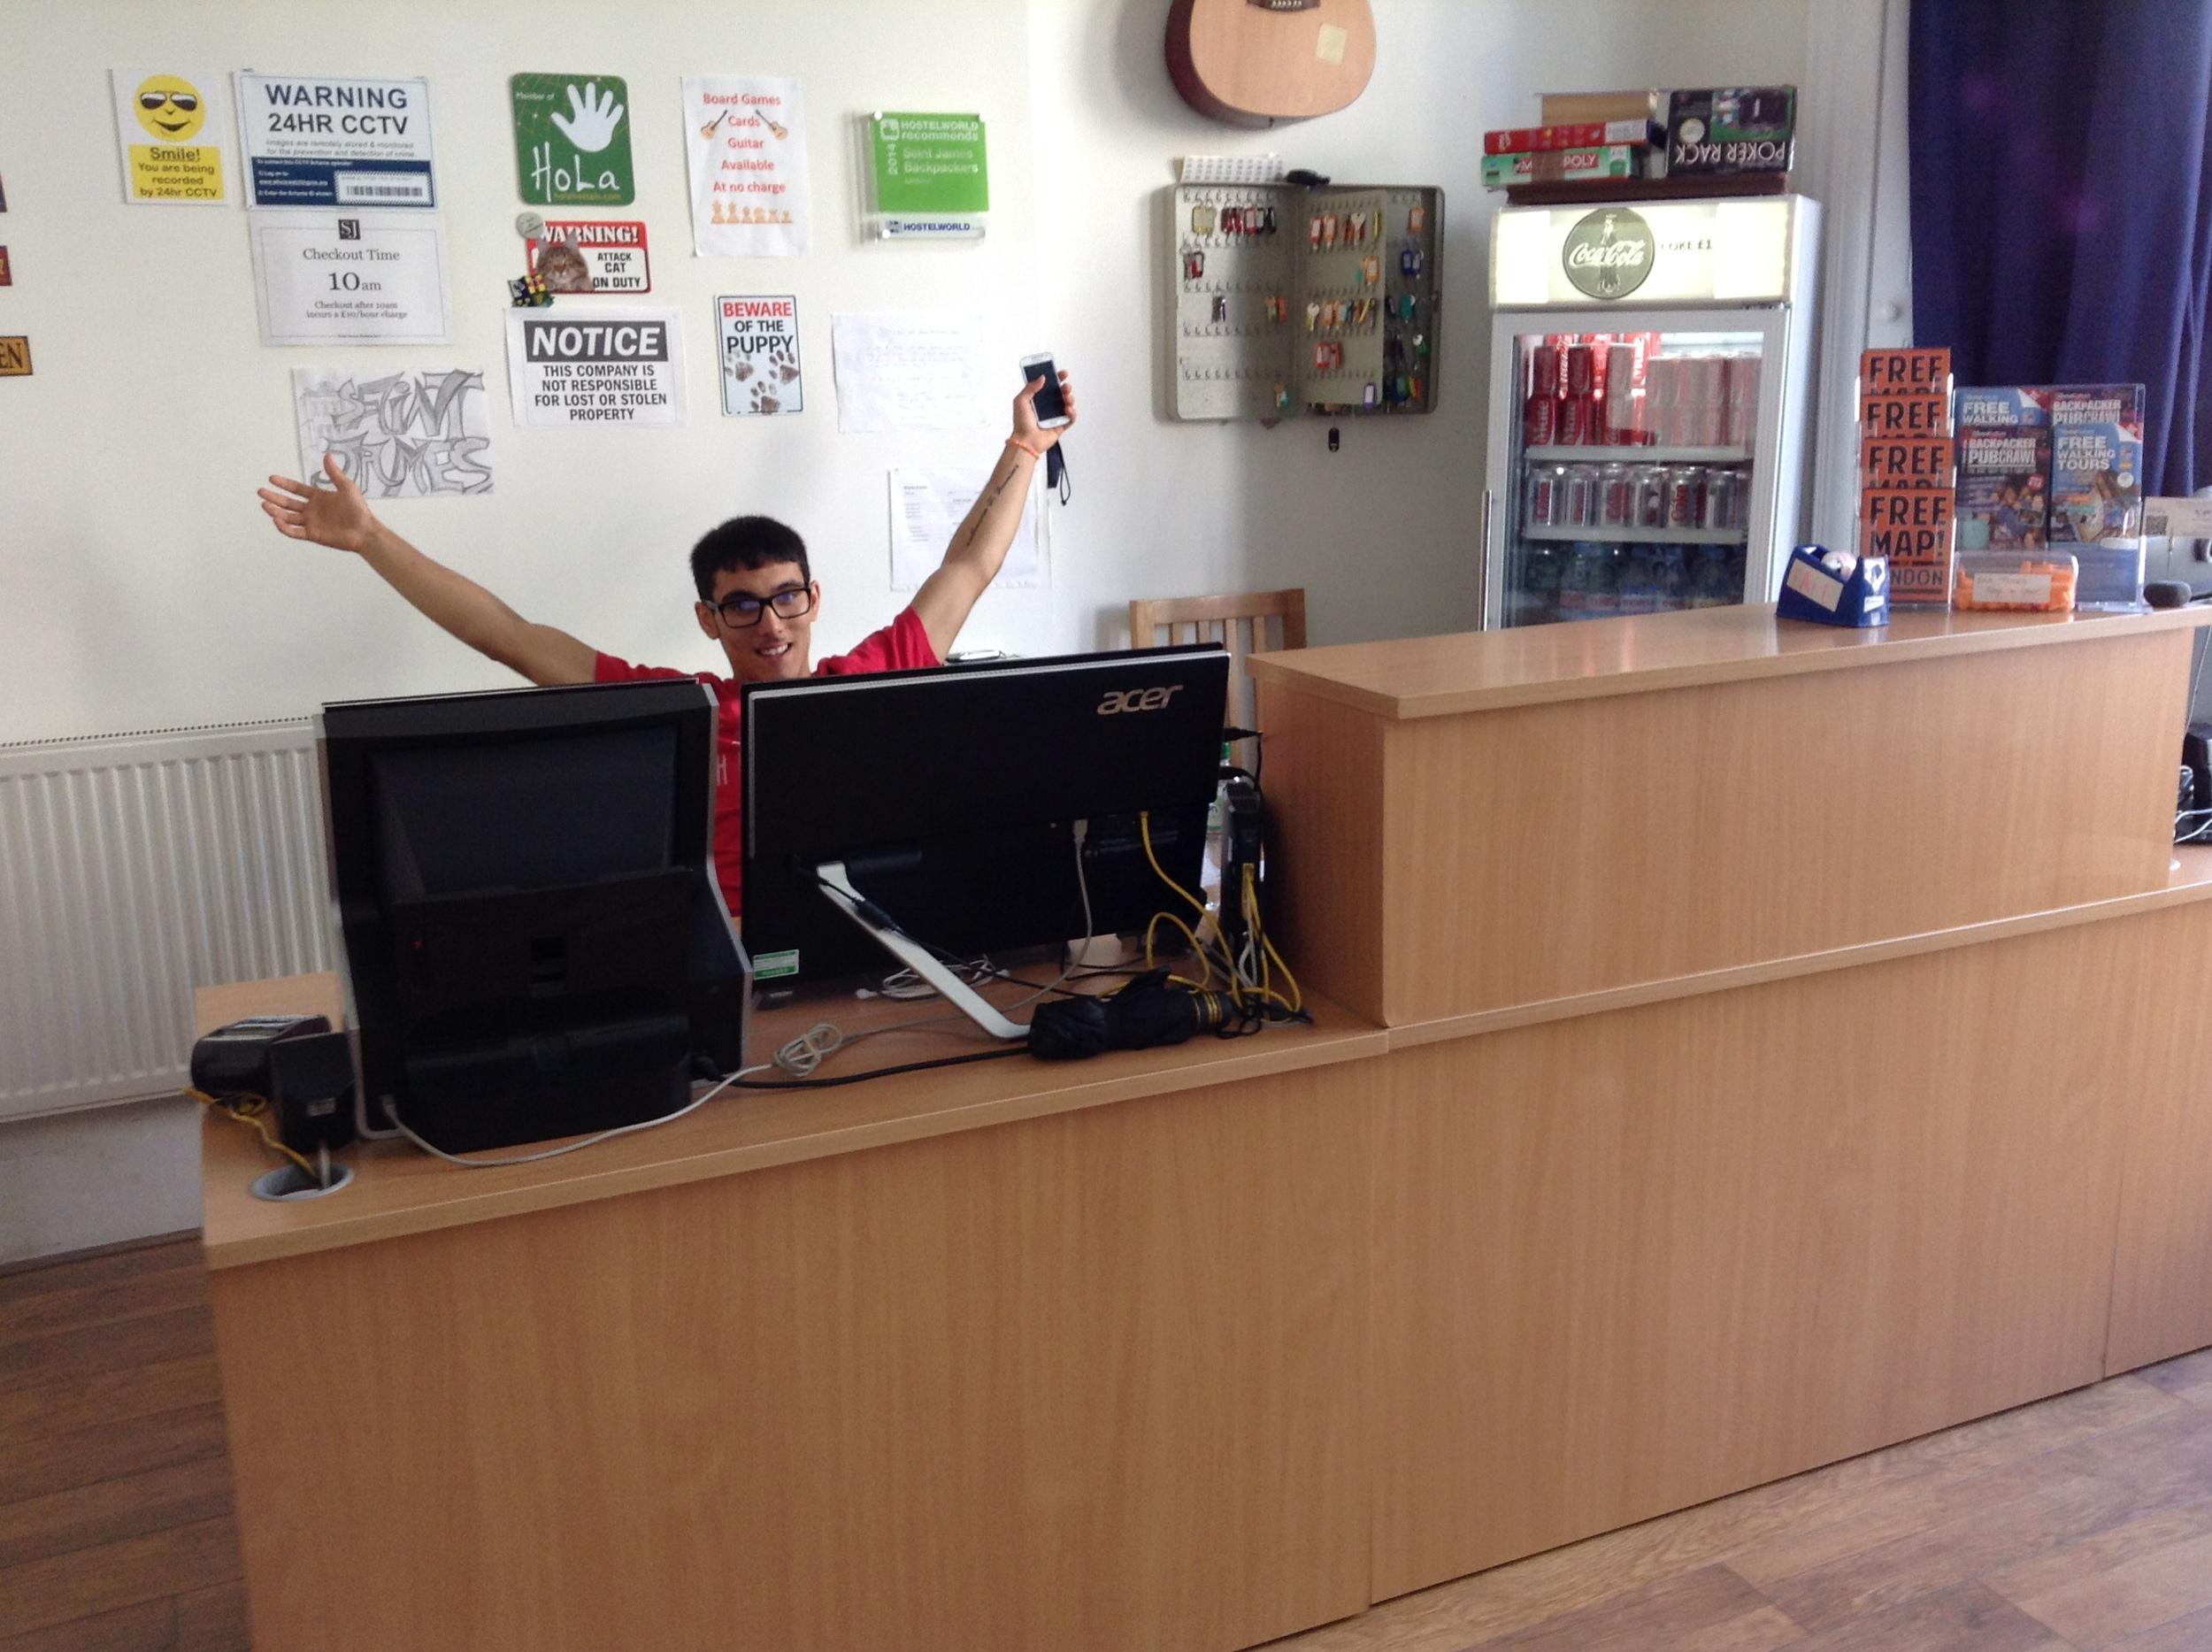 hostel-reception-welcome.JPG